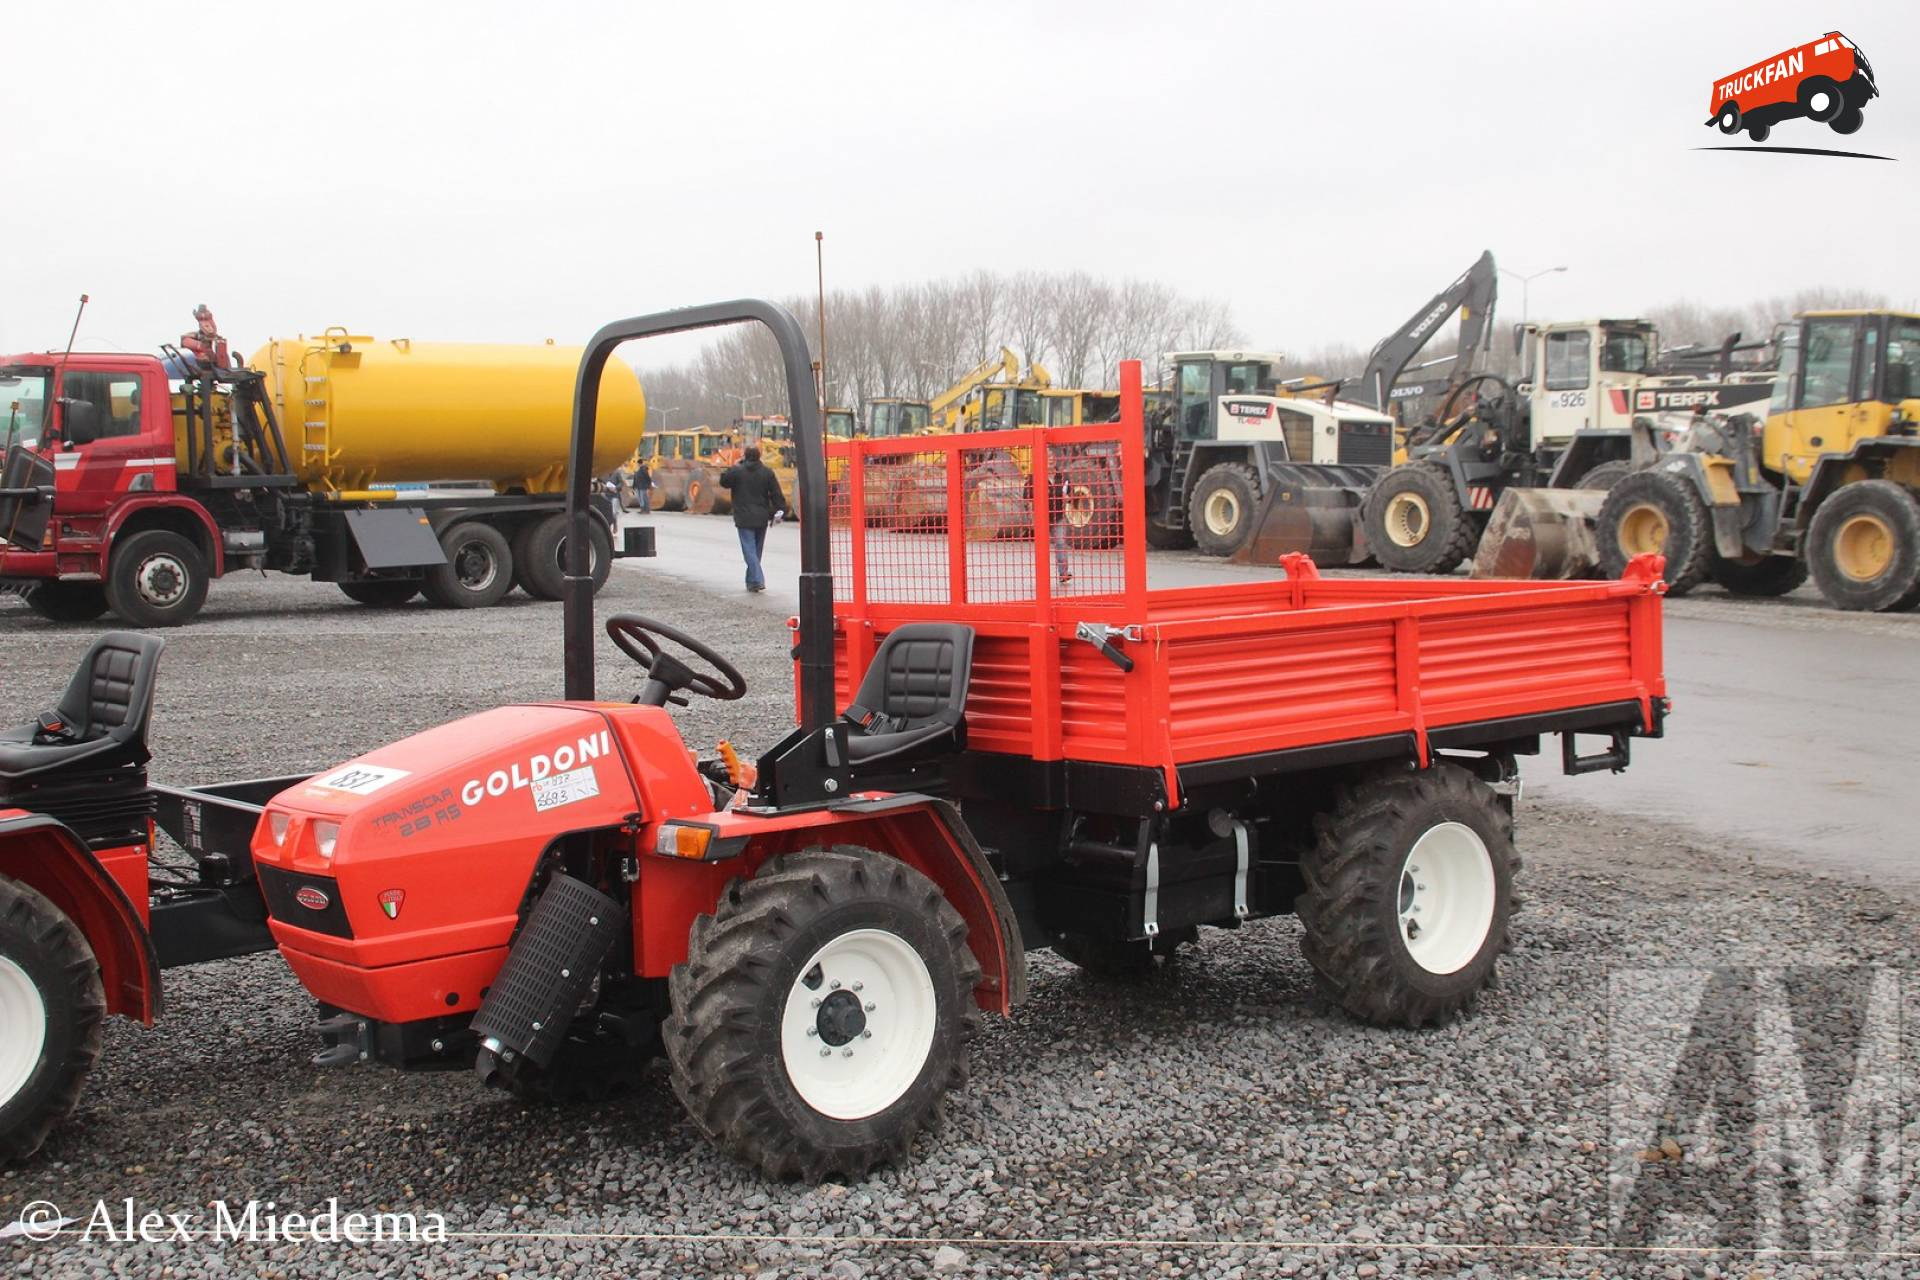 Goldoni Transcar